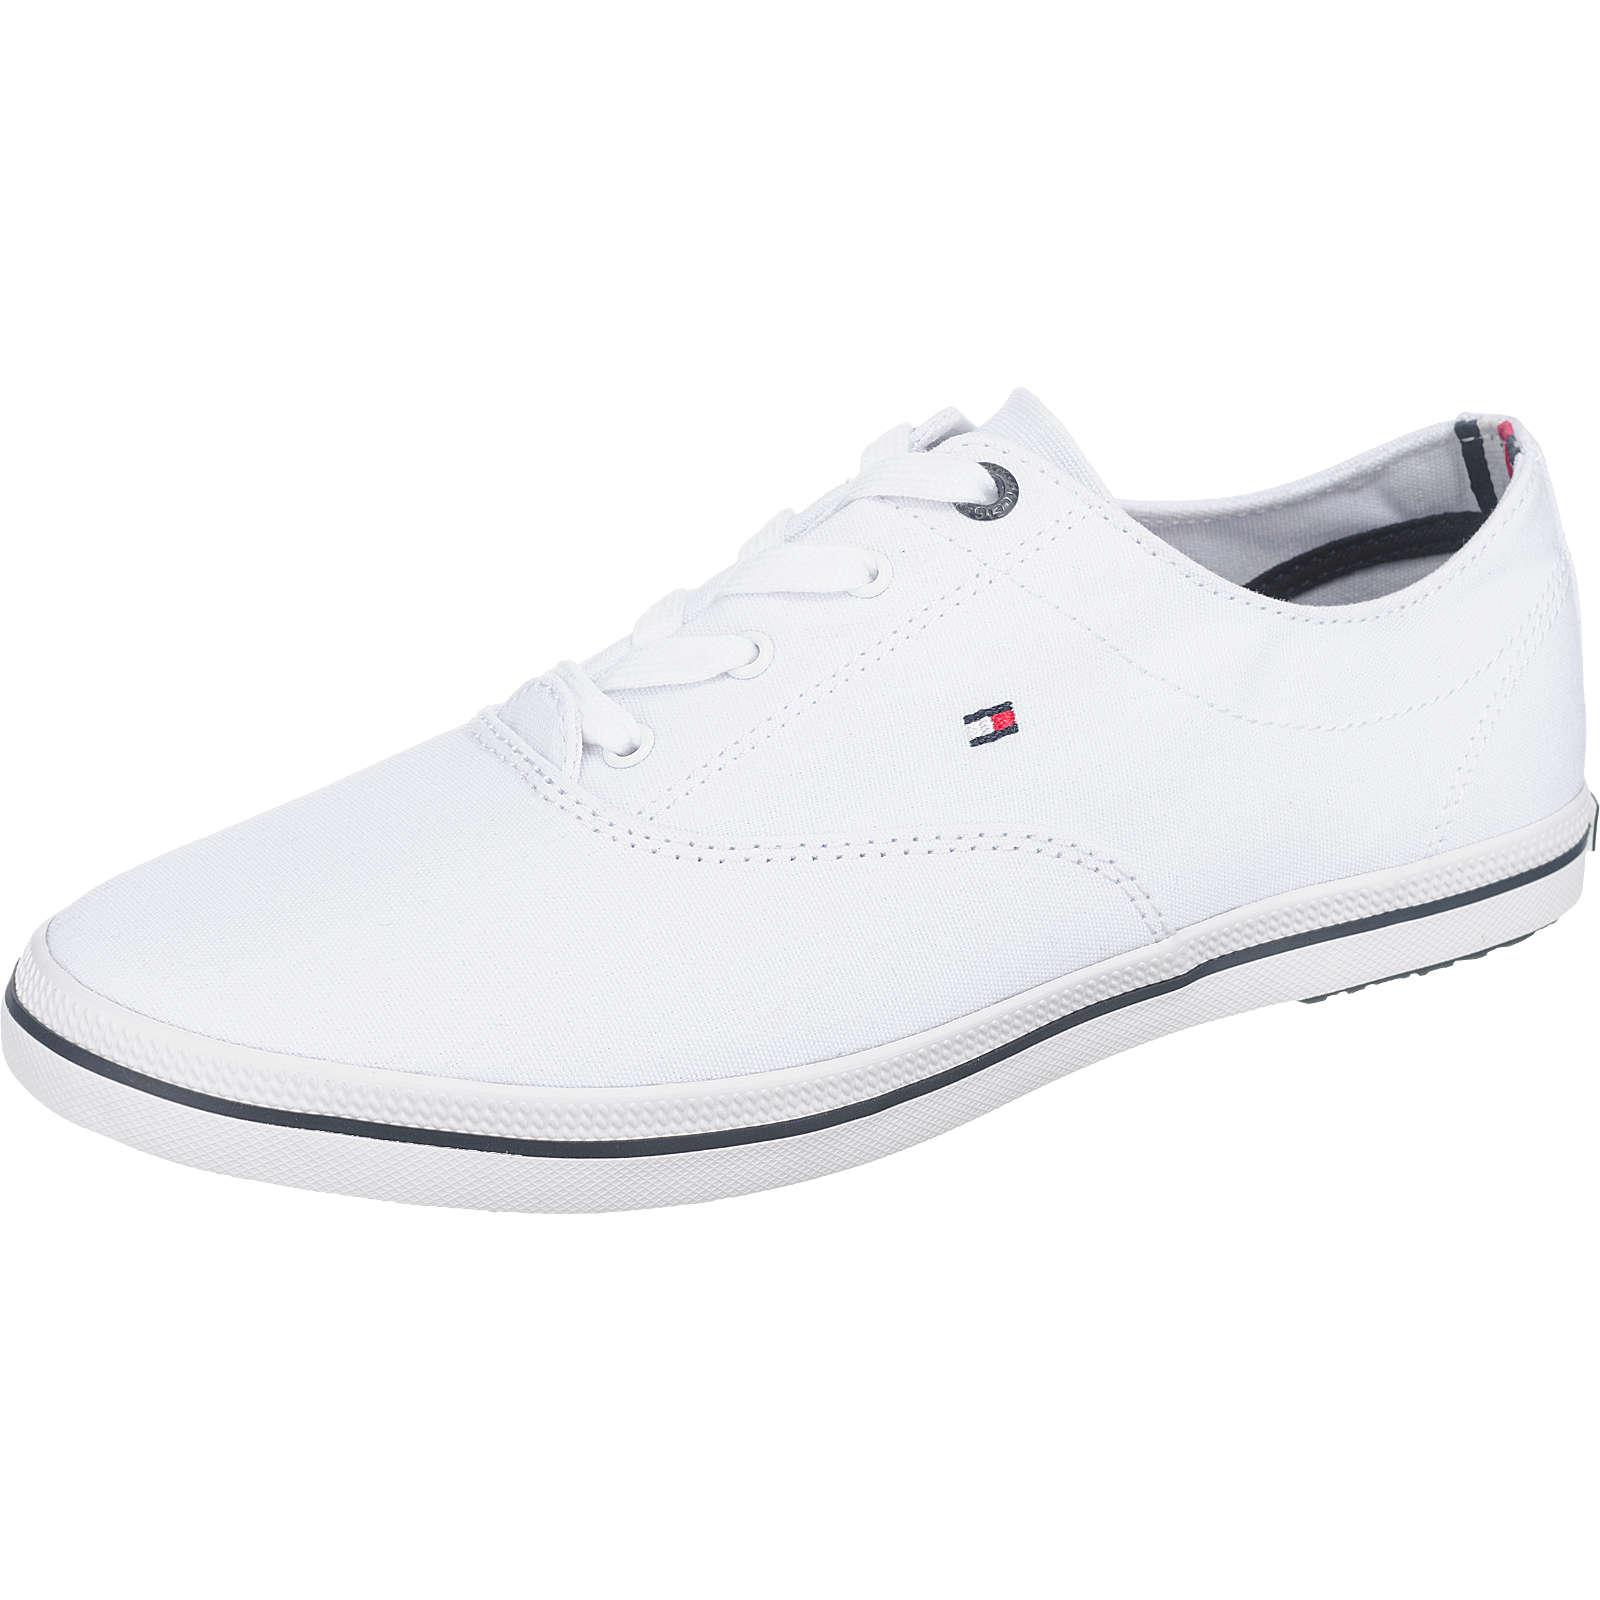 TOMMY HILFIGER Int Erin Sneakers weiß Damen Gr. 36